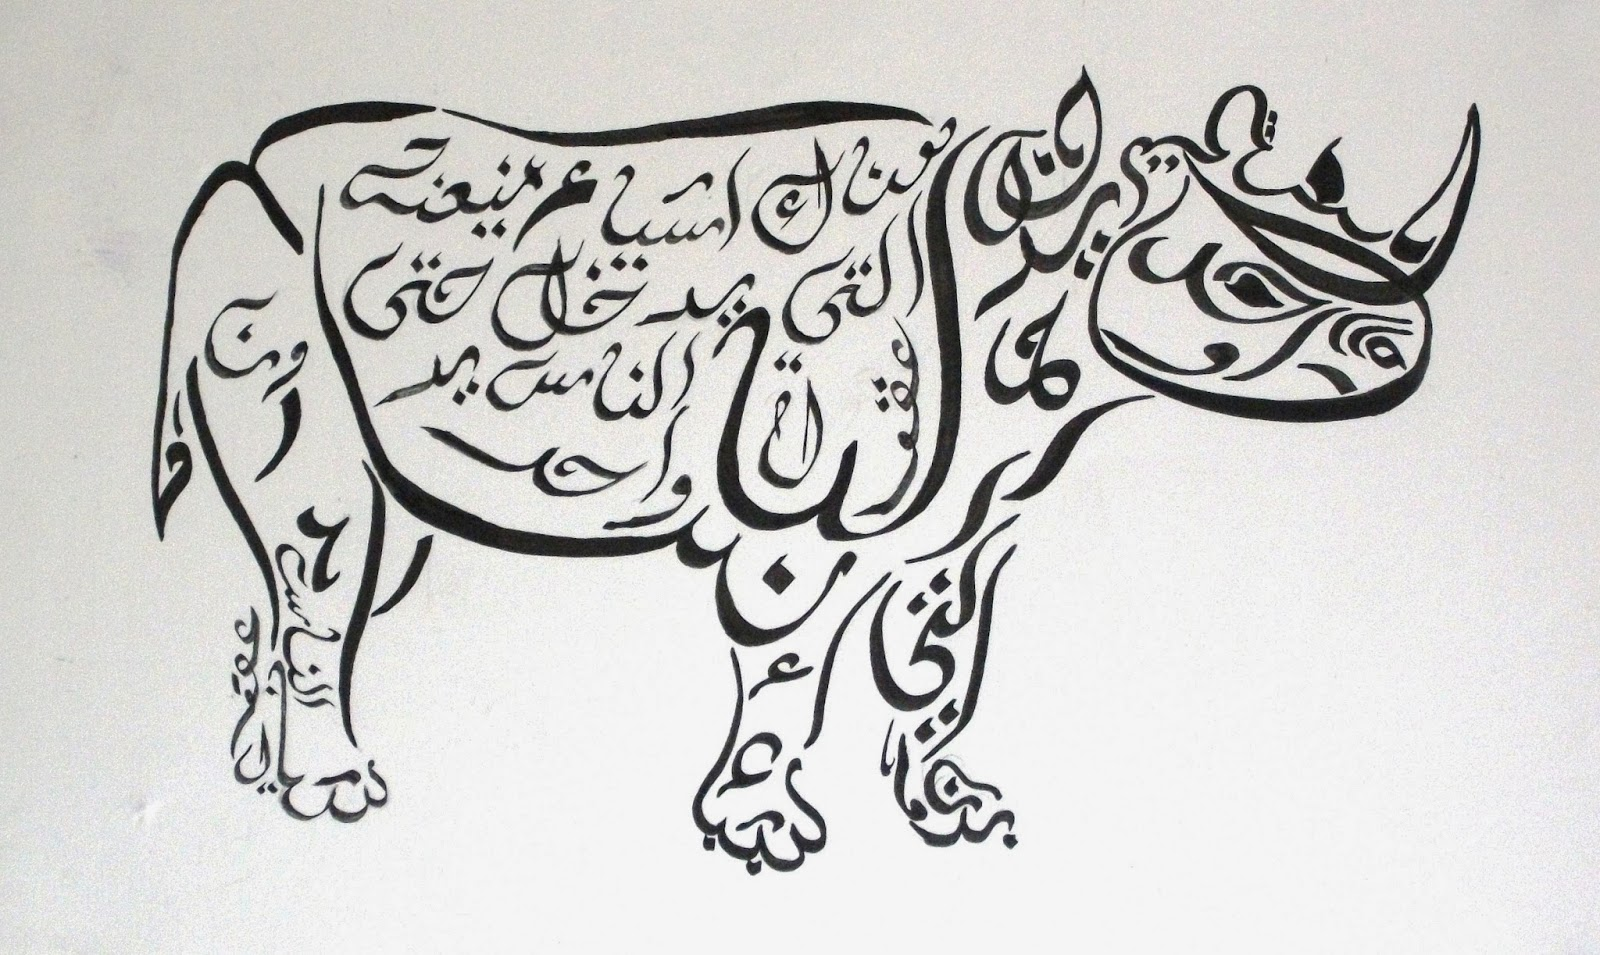 Kaligrafi Gambar Kaligrafi Motif Badak Images Frompo